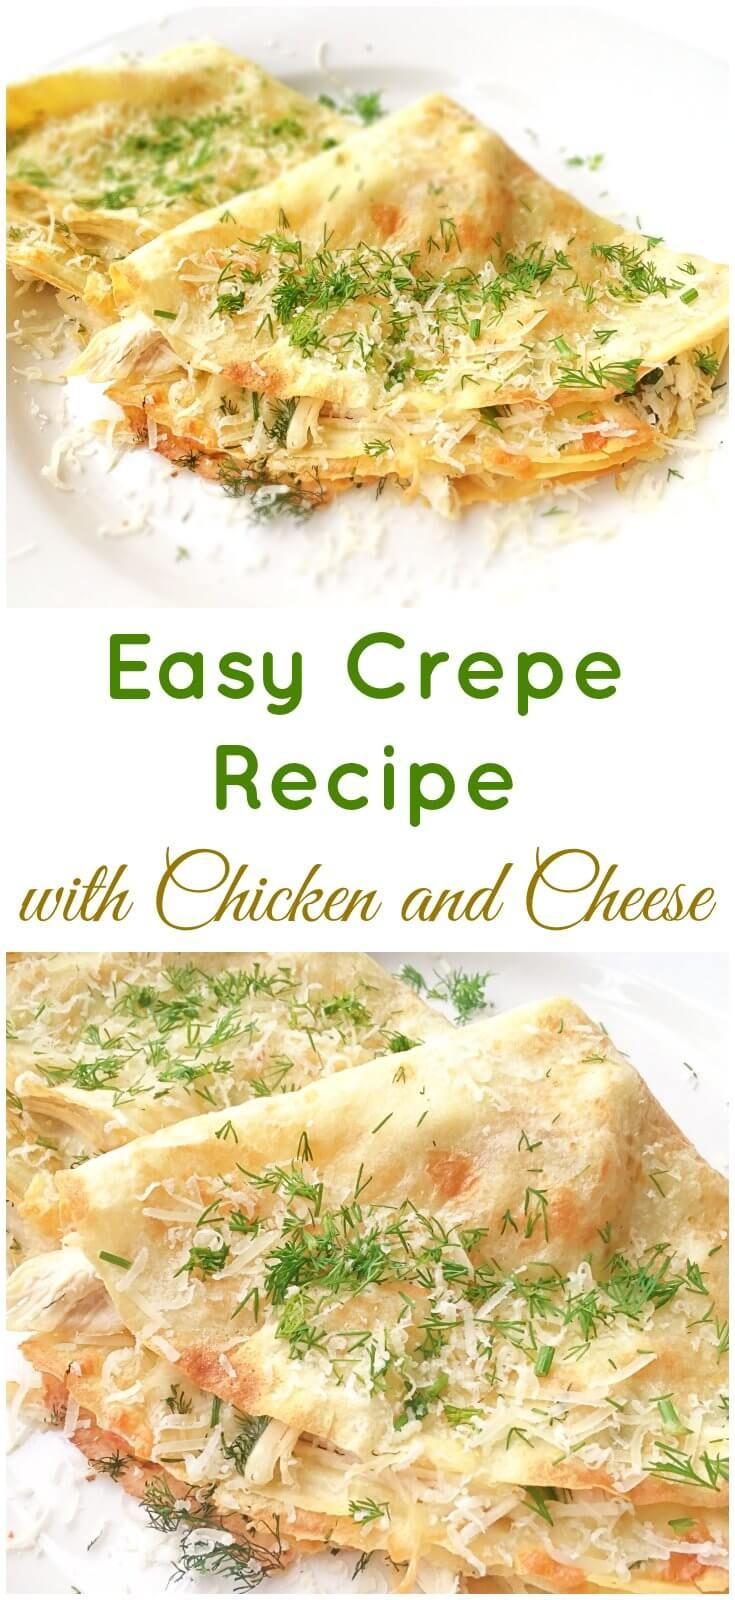 Crepe Recipe Filling